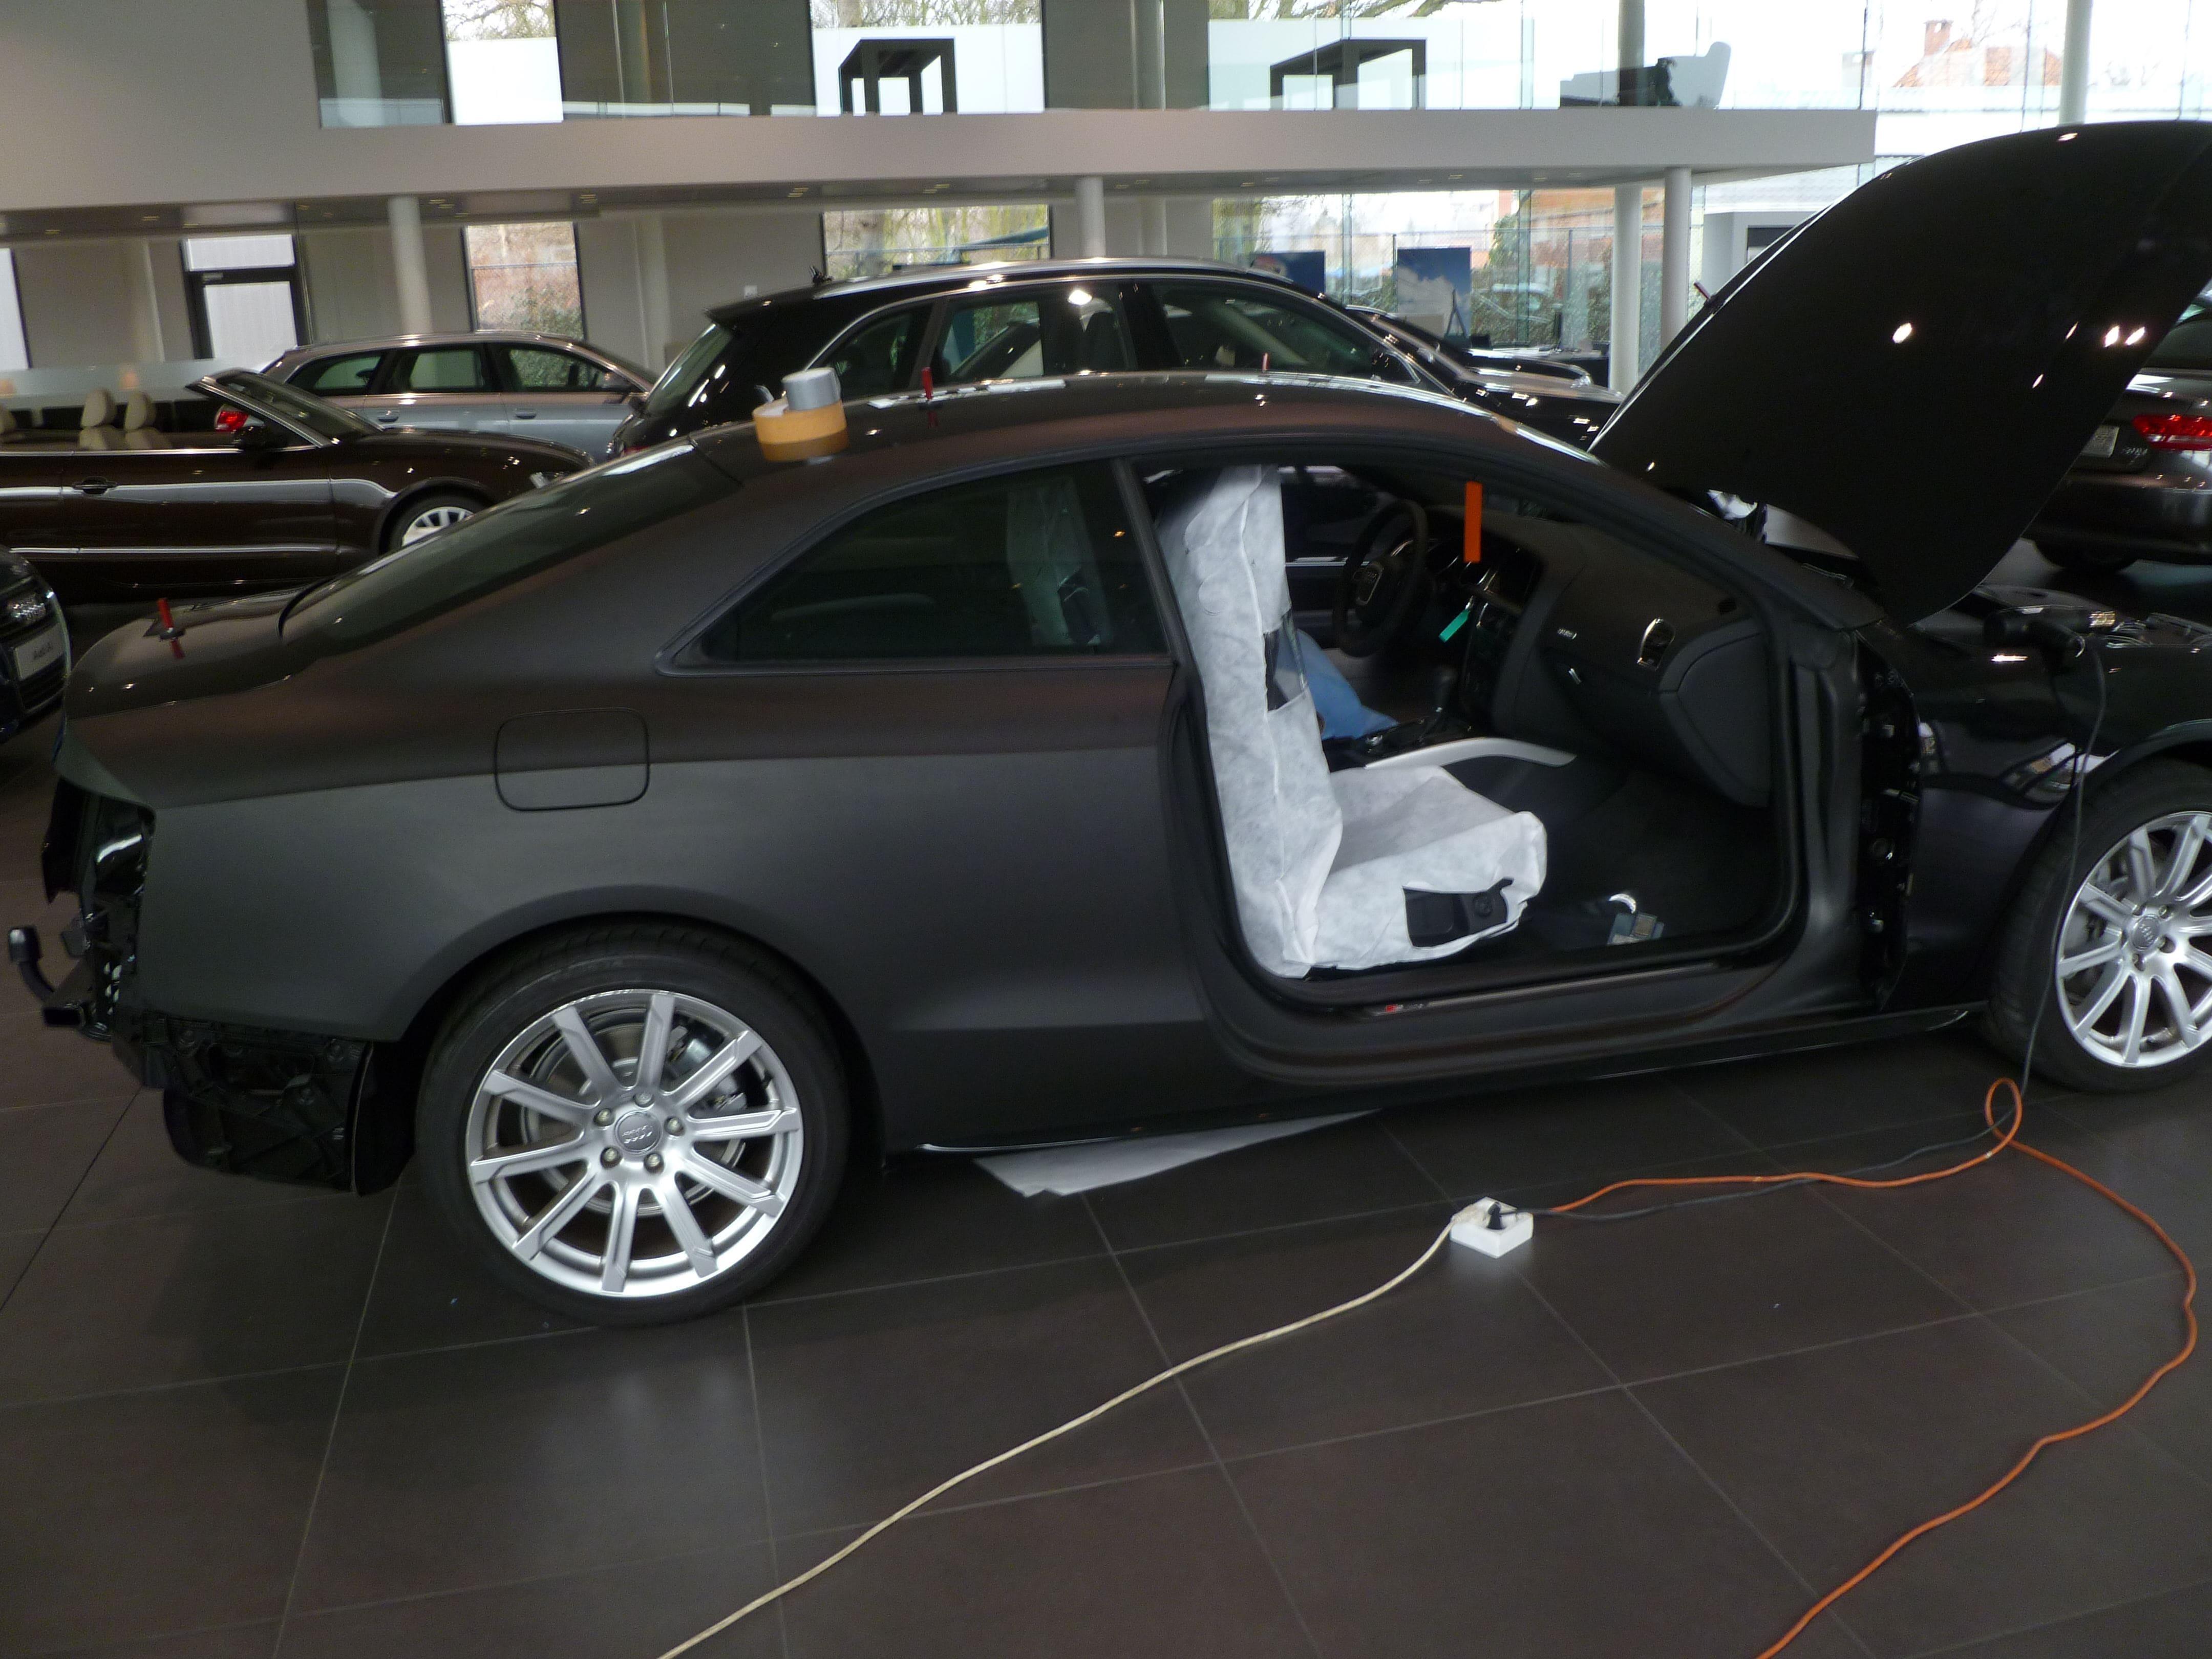 Audi A5 Coupe met Mat Zwarte Wrap, Carwrapping door Wrapmyride.nu Foto-nr:4619, ©2021